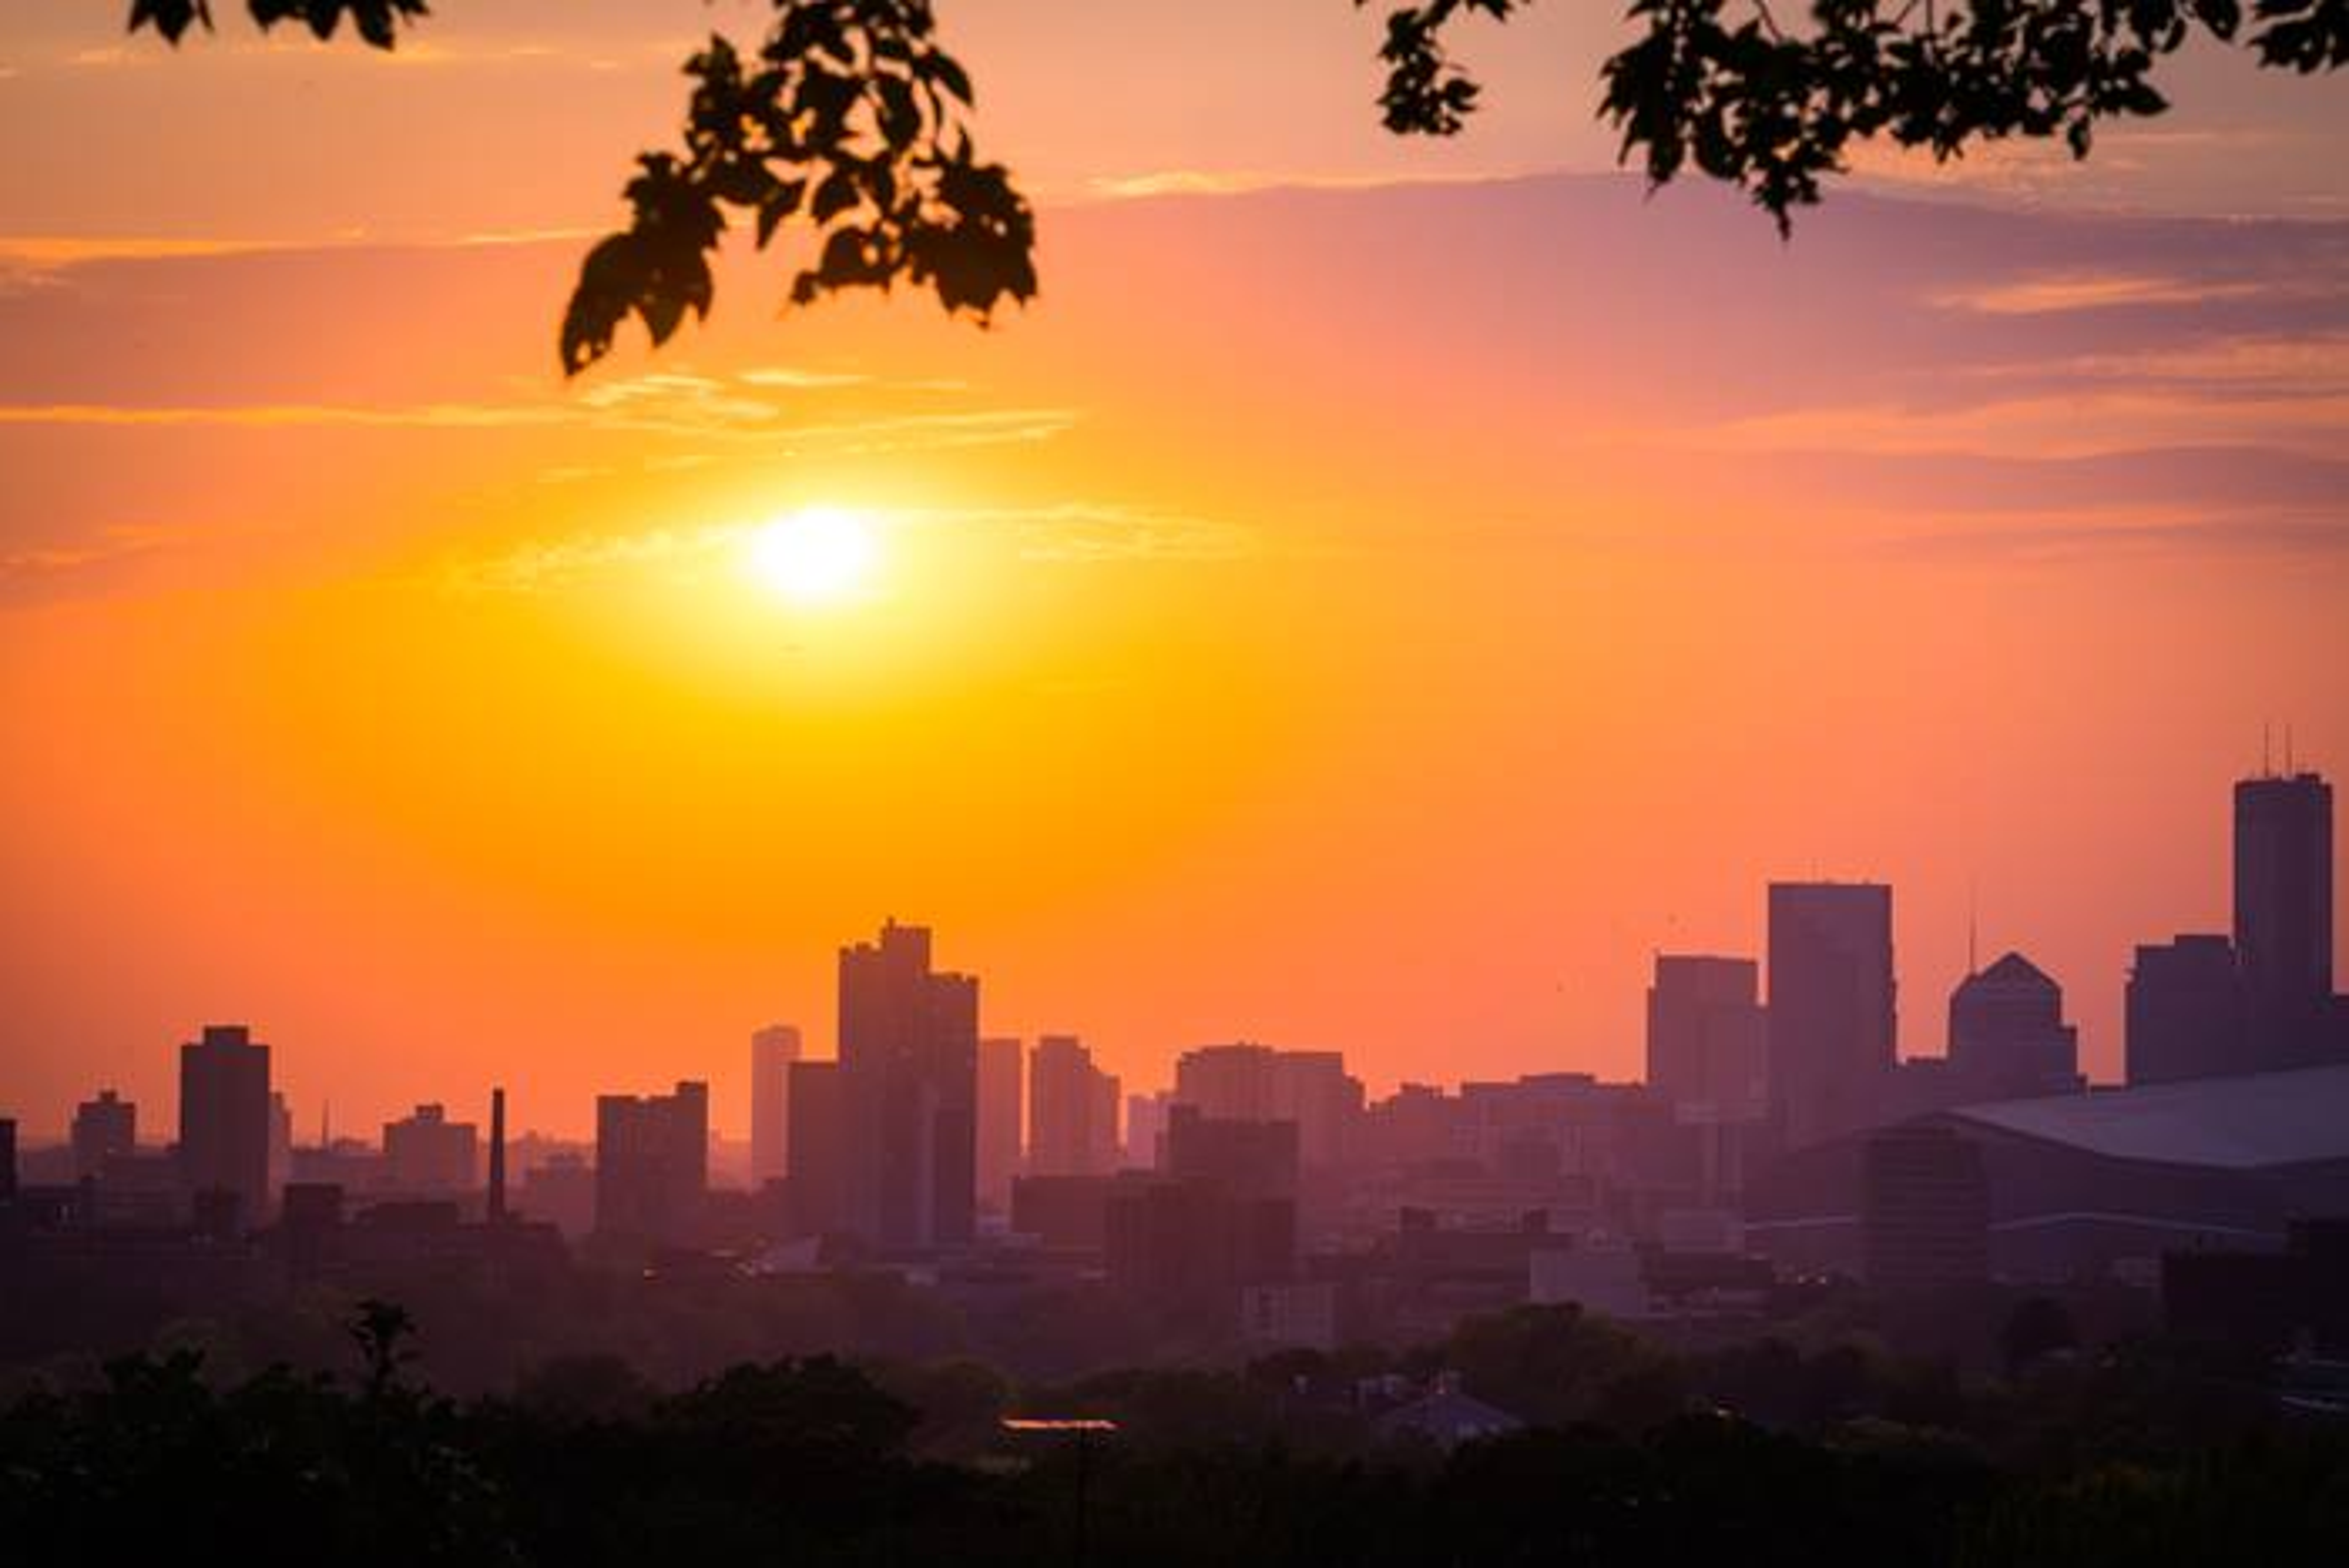 Minneapolis Minnesota skyline at sunset